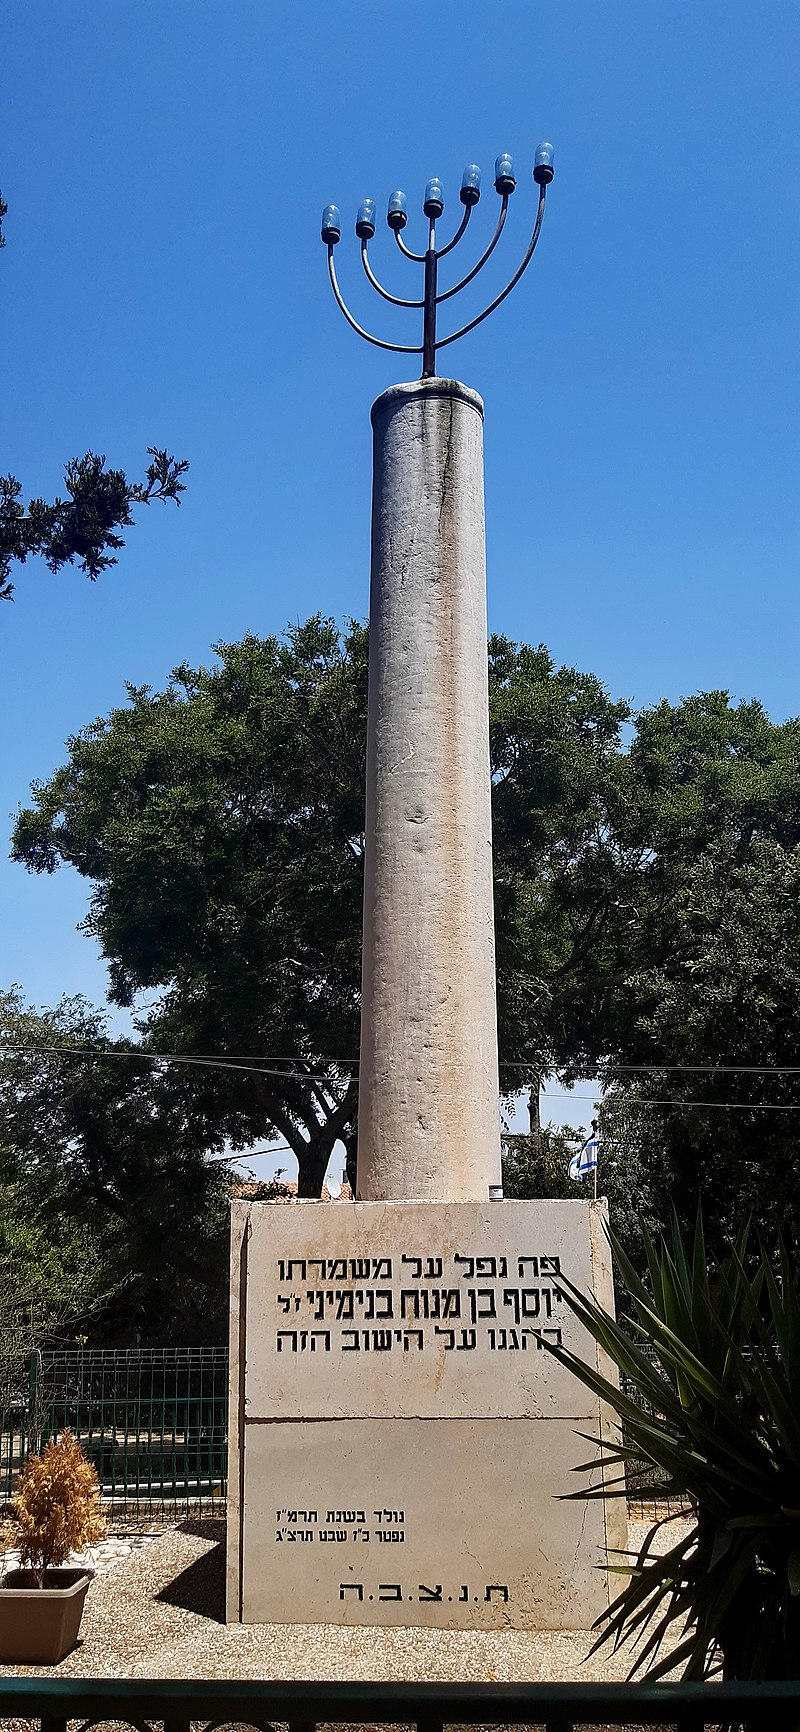 אנדרטה ליוסף בנימיני באביחיל